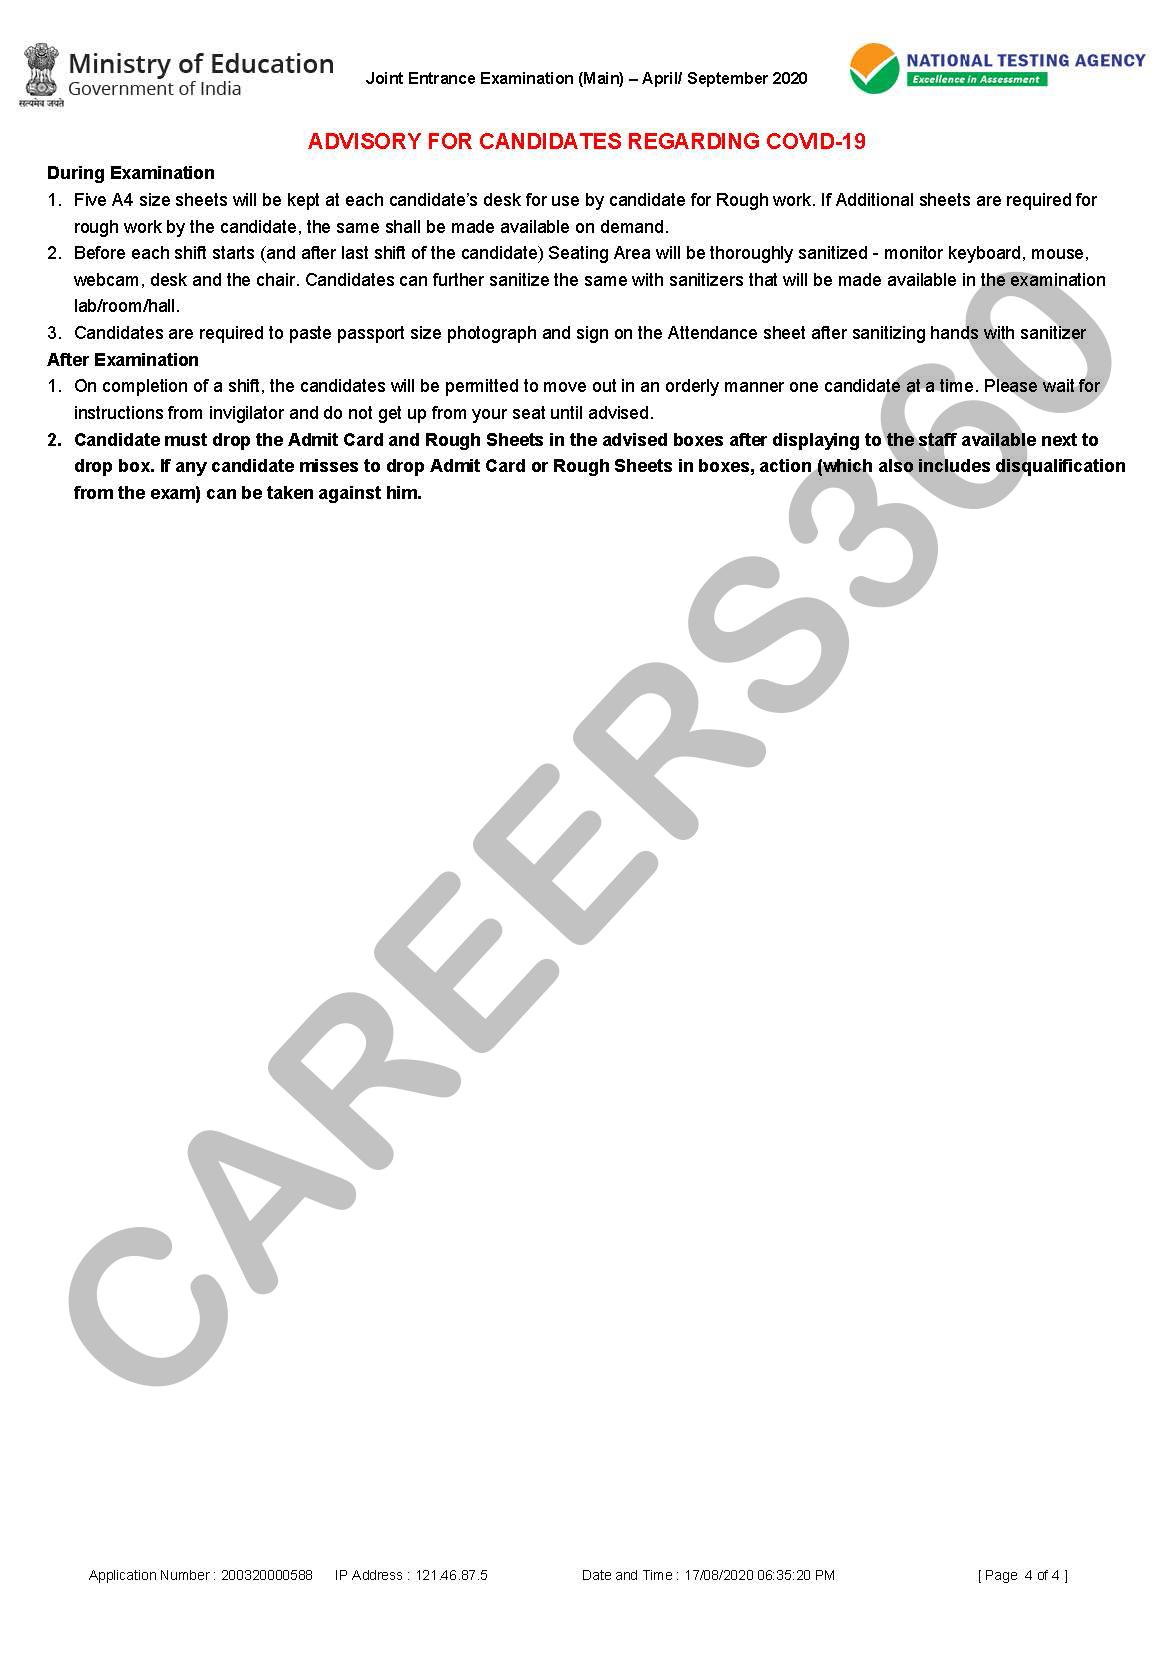 JEE Main 2020 Exam Guidelines-3